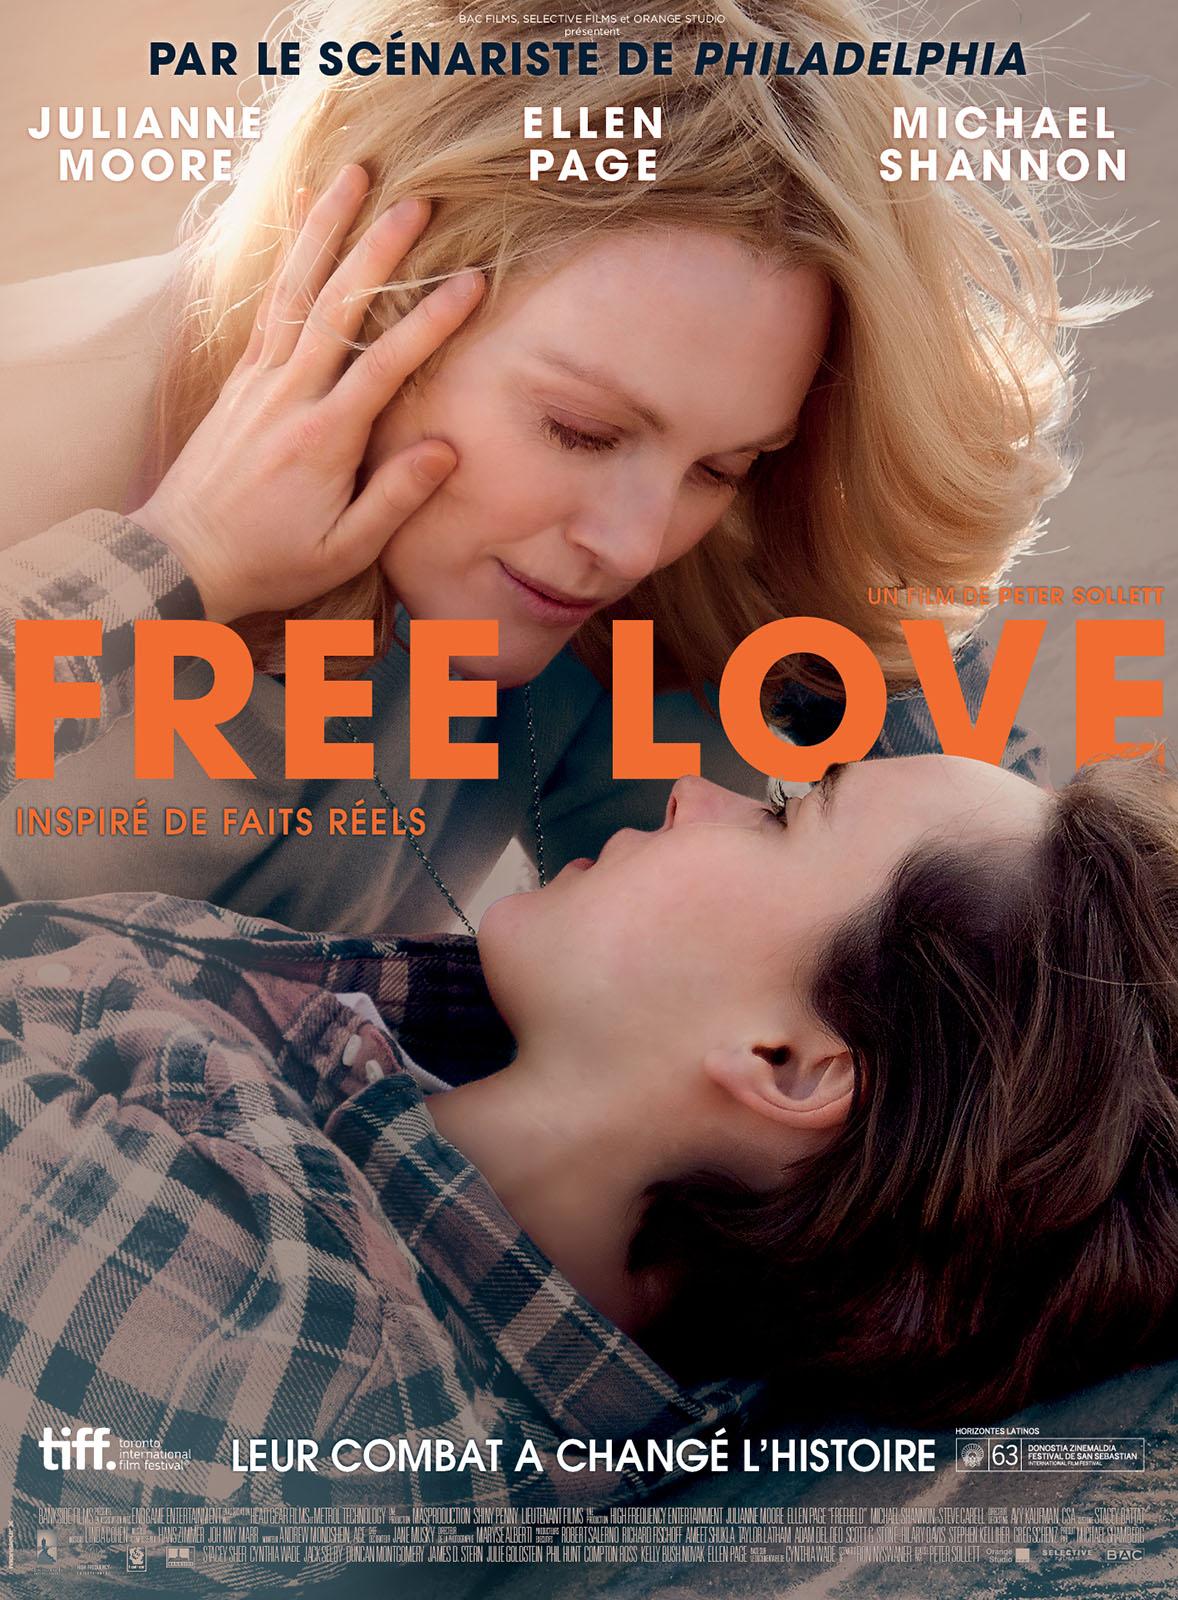 Free love - Freeheld